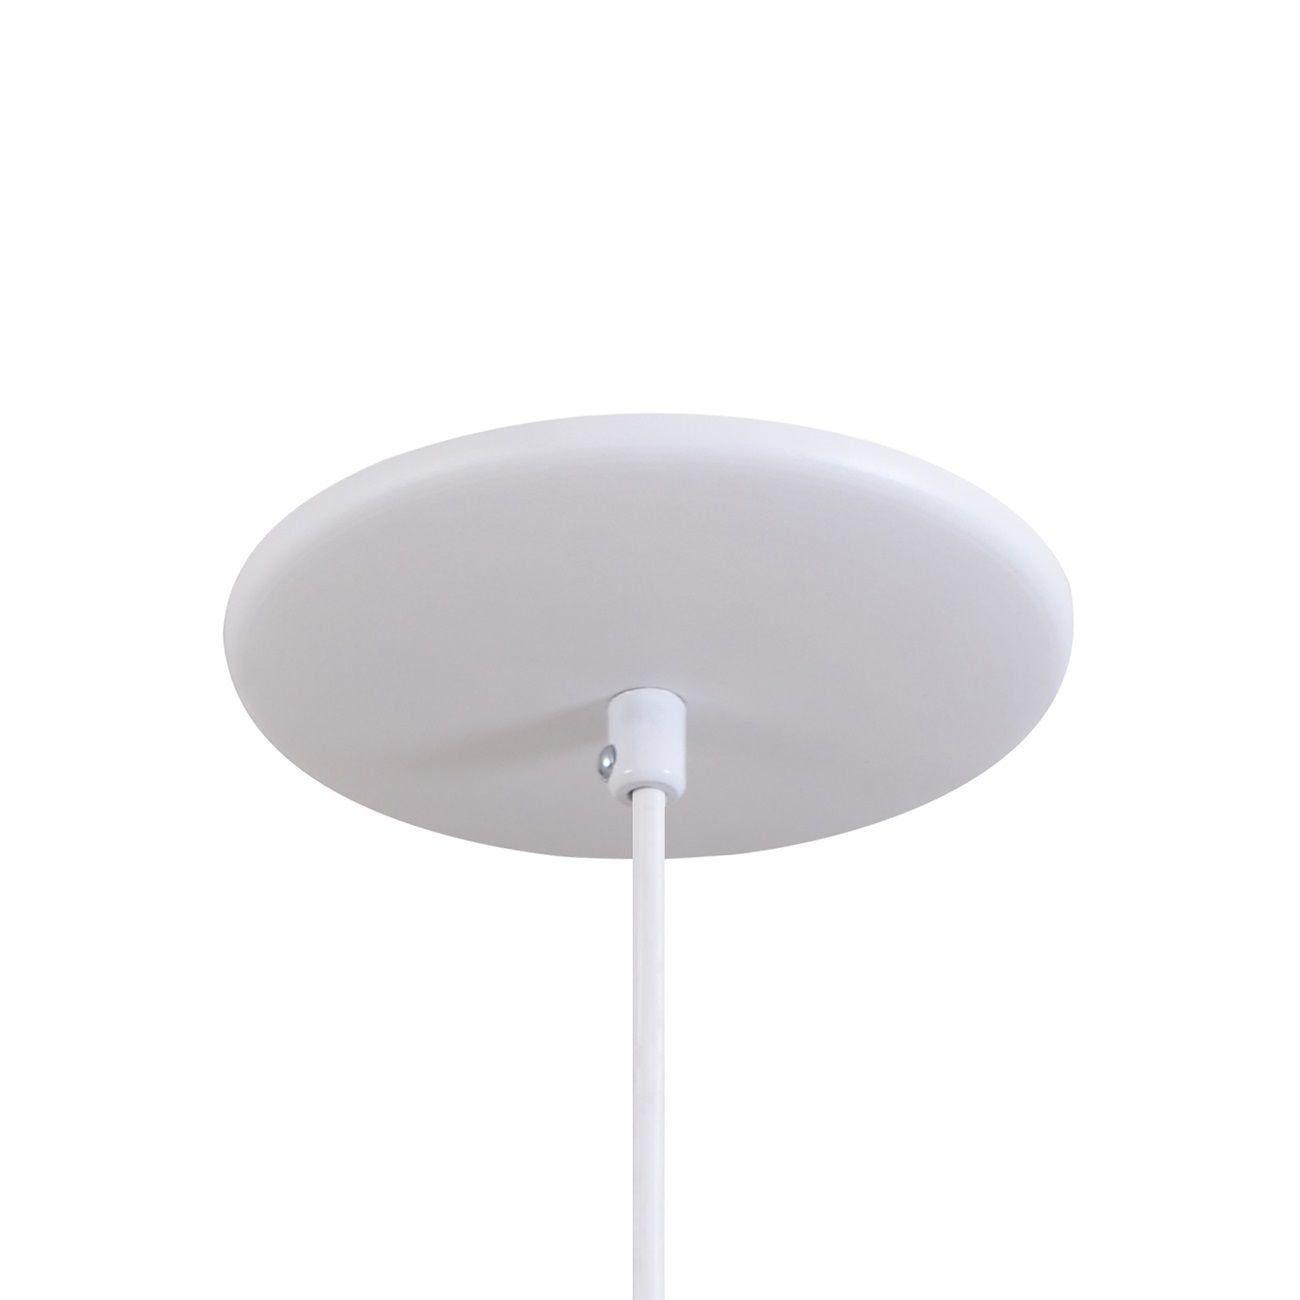 Pendente Retrô 34cm Luminária Lustre Alumínio Branco Textura C/ Laranja - Rei Da Iluminação